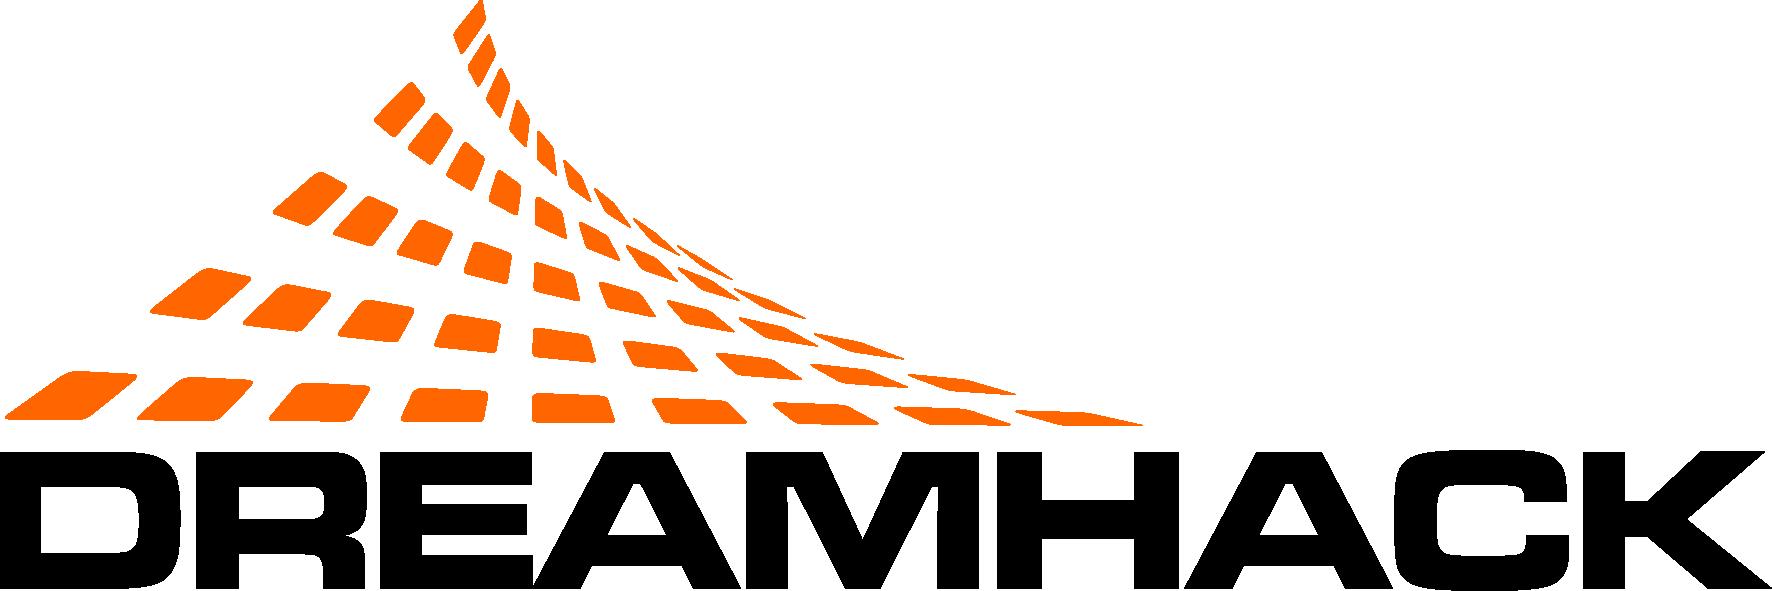 DreamHack_onWhite-RGB.png